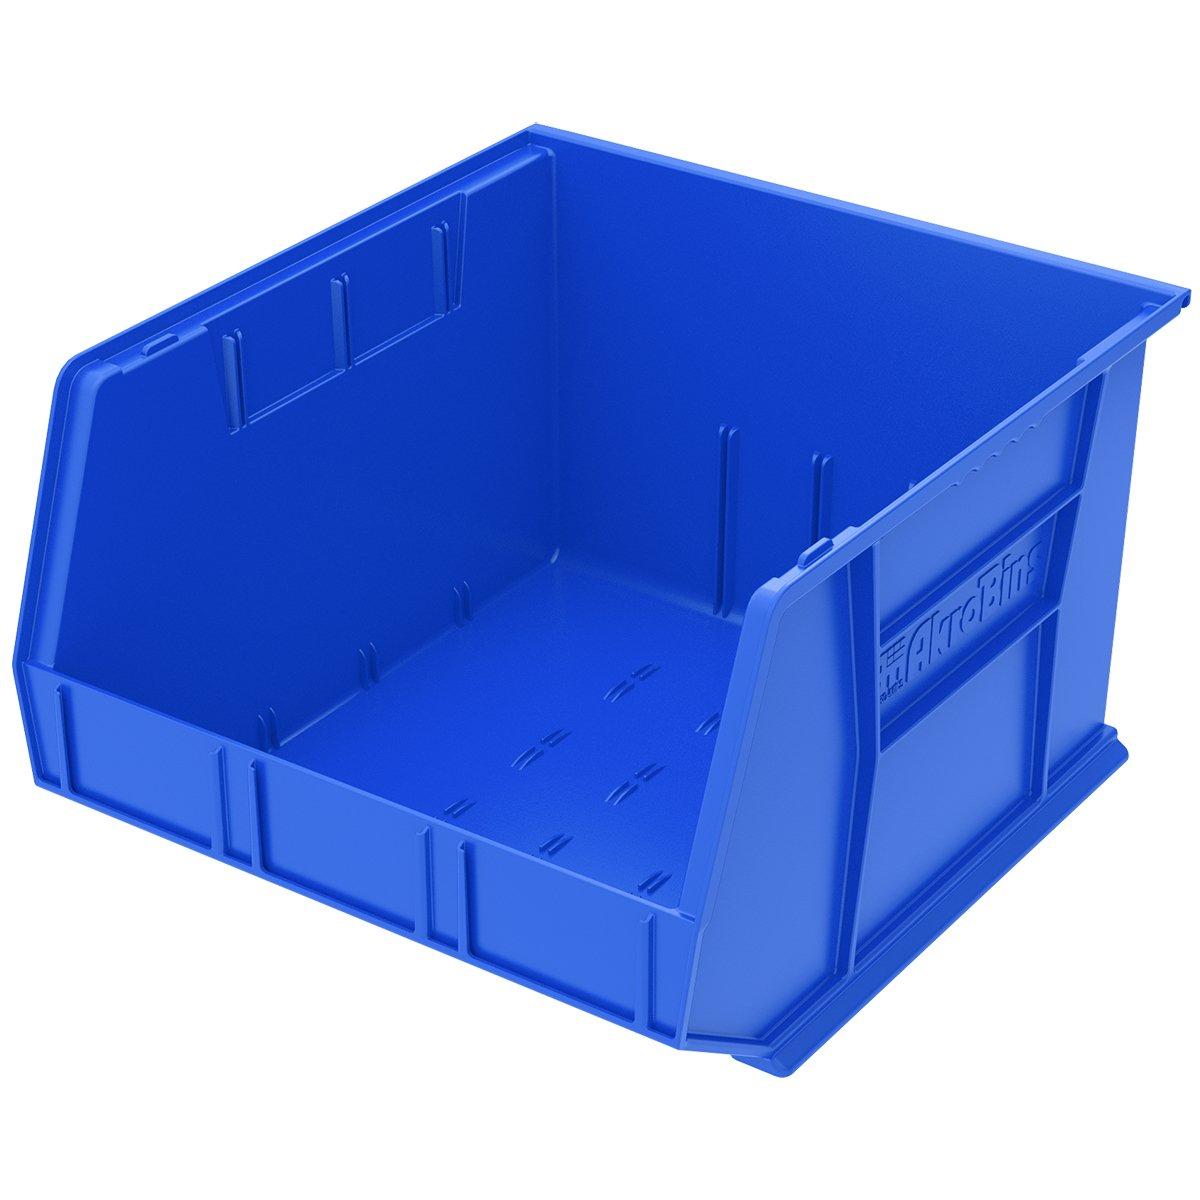 Akro-Mils 30270 Plastic Storage Stacking AkroBin, 18-Inch by 16-Inch by 11-Inch, Blue, Case of 3 by Akro-Mils